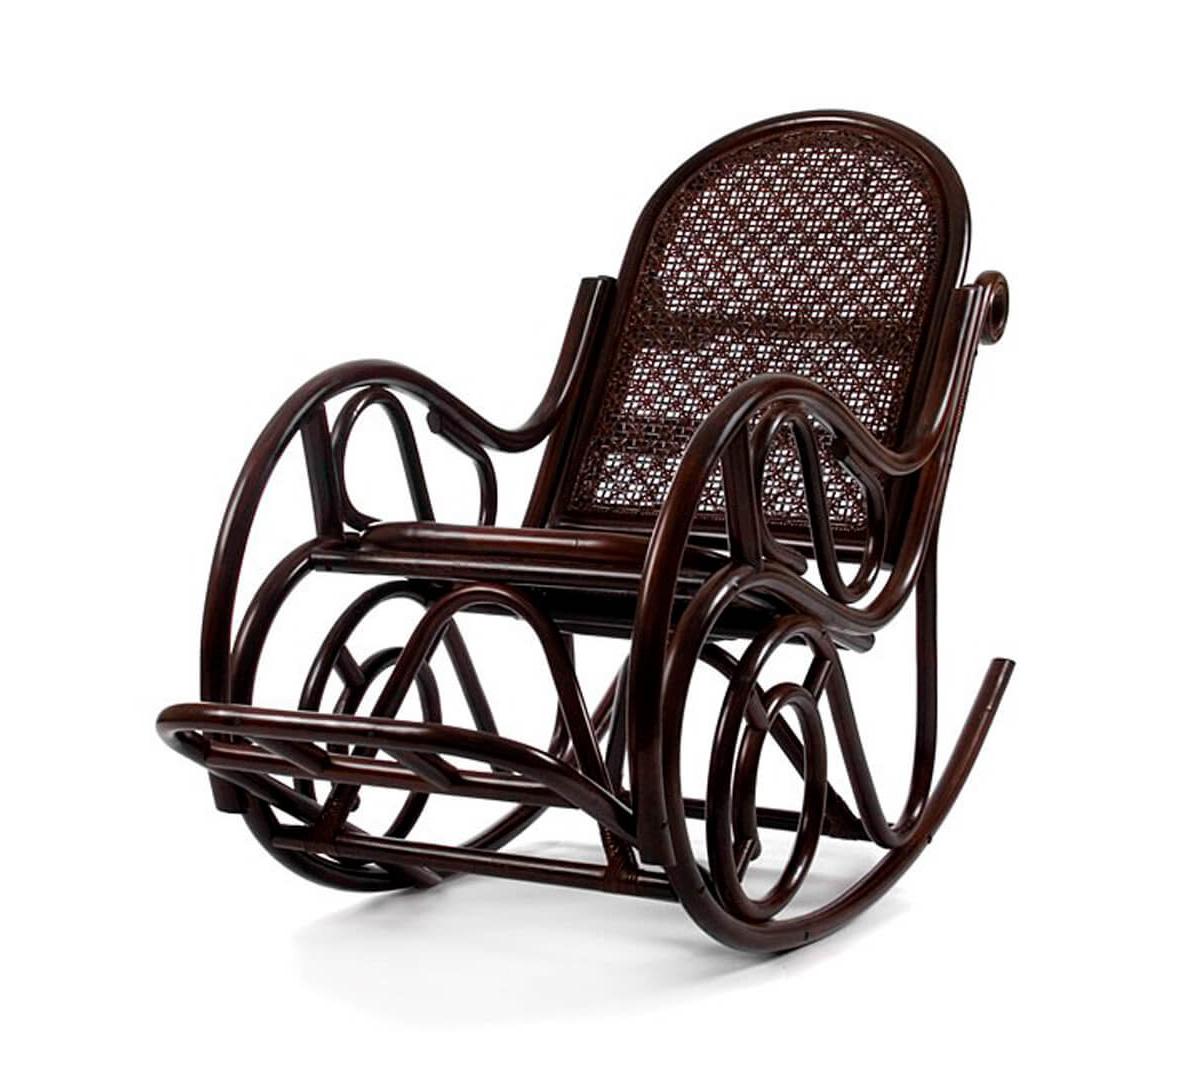 Кресло-качалка Moscow фото